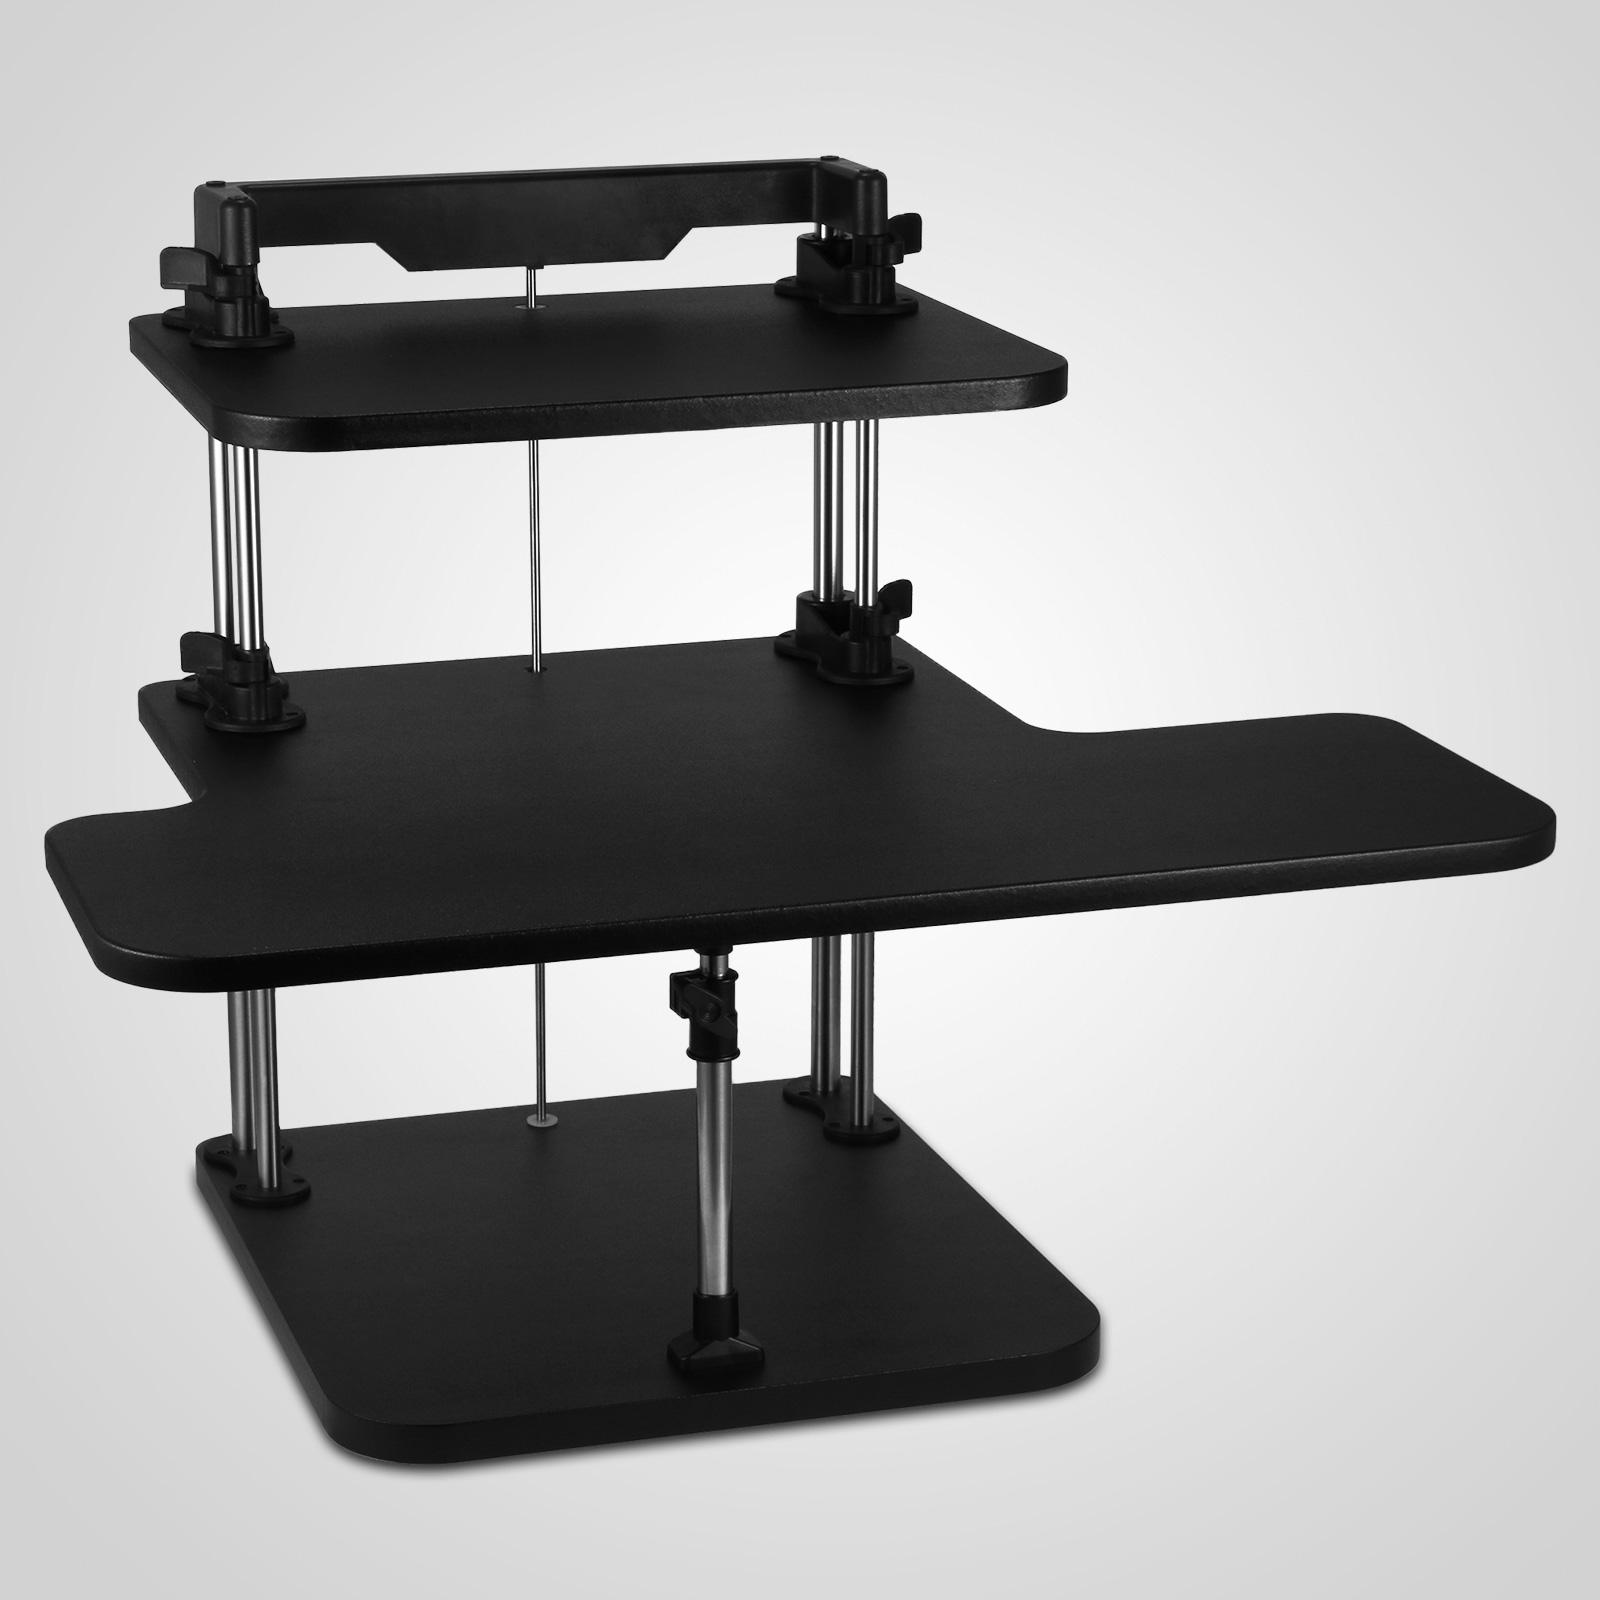 3 tier adjustable computer standing desk sit stand light weight home office ebay. Black Bedroom Furniture Sets. Home Design Ideas